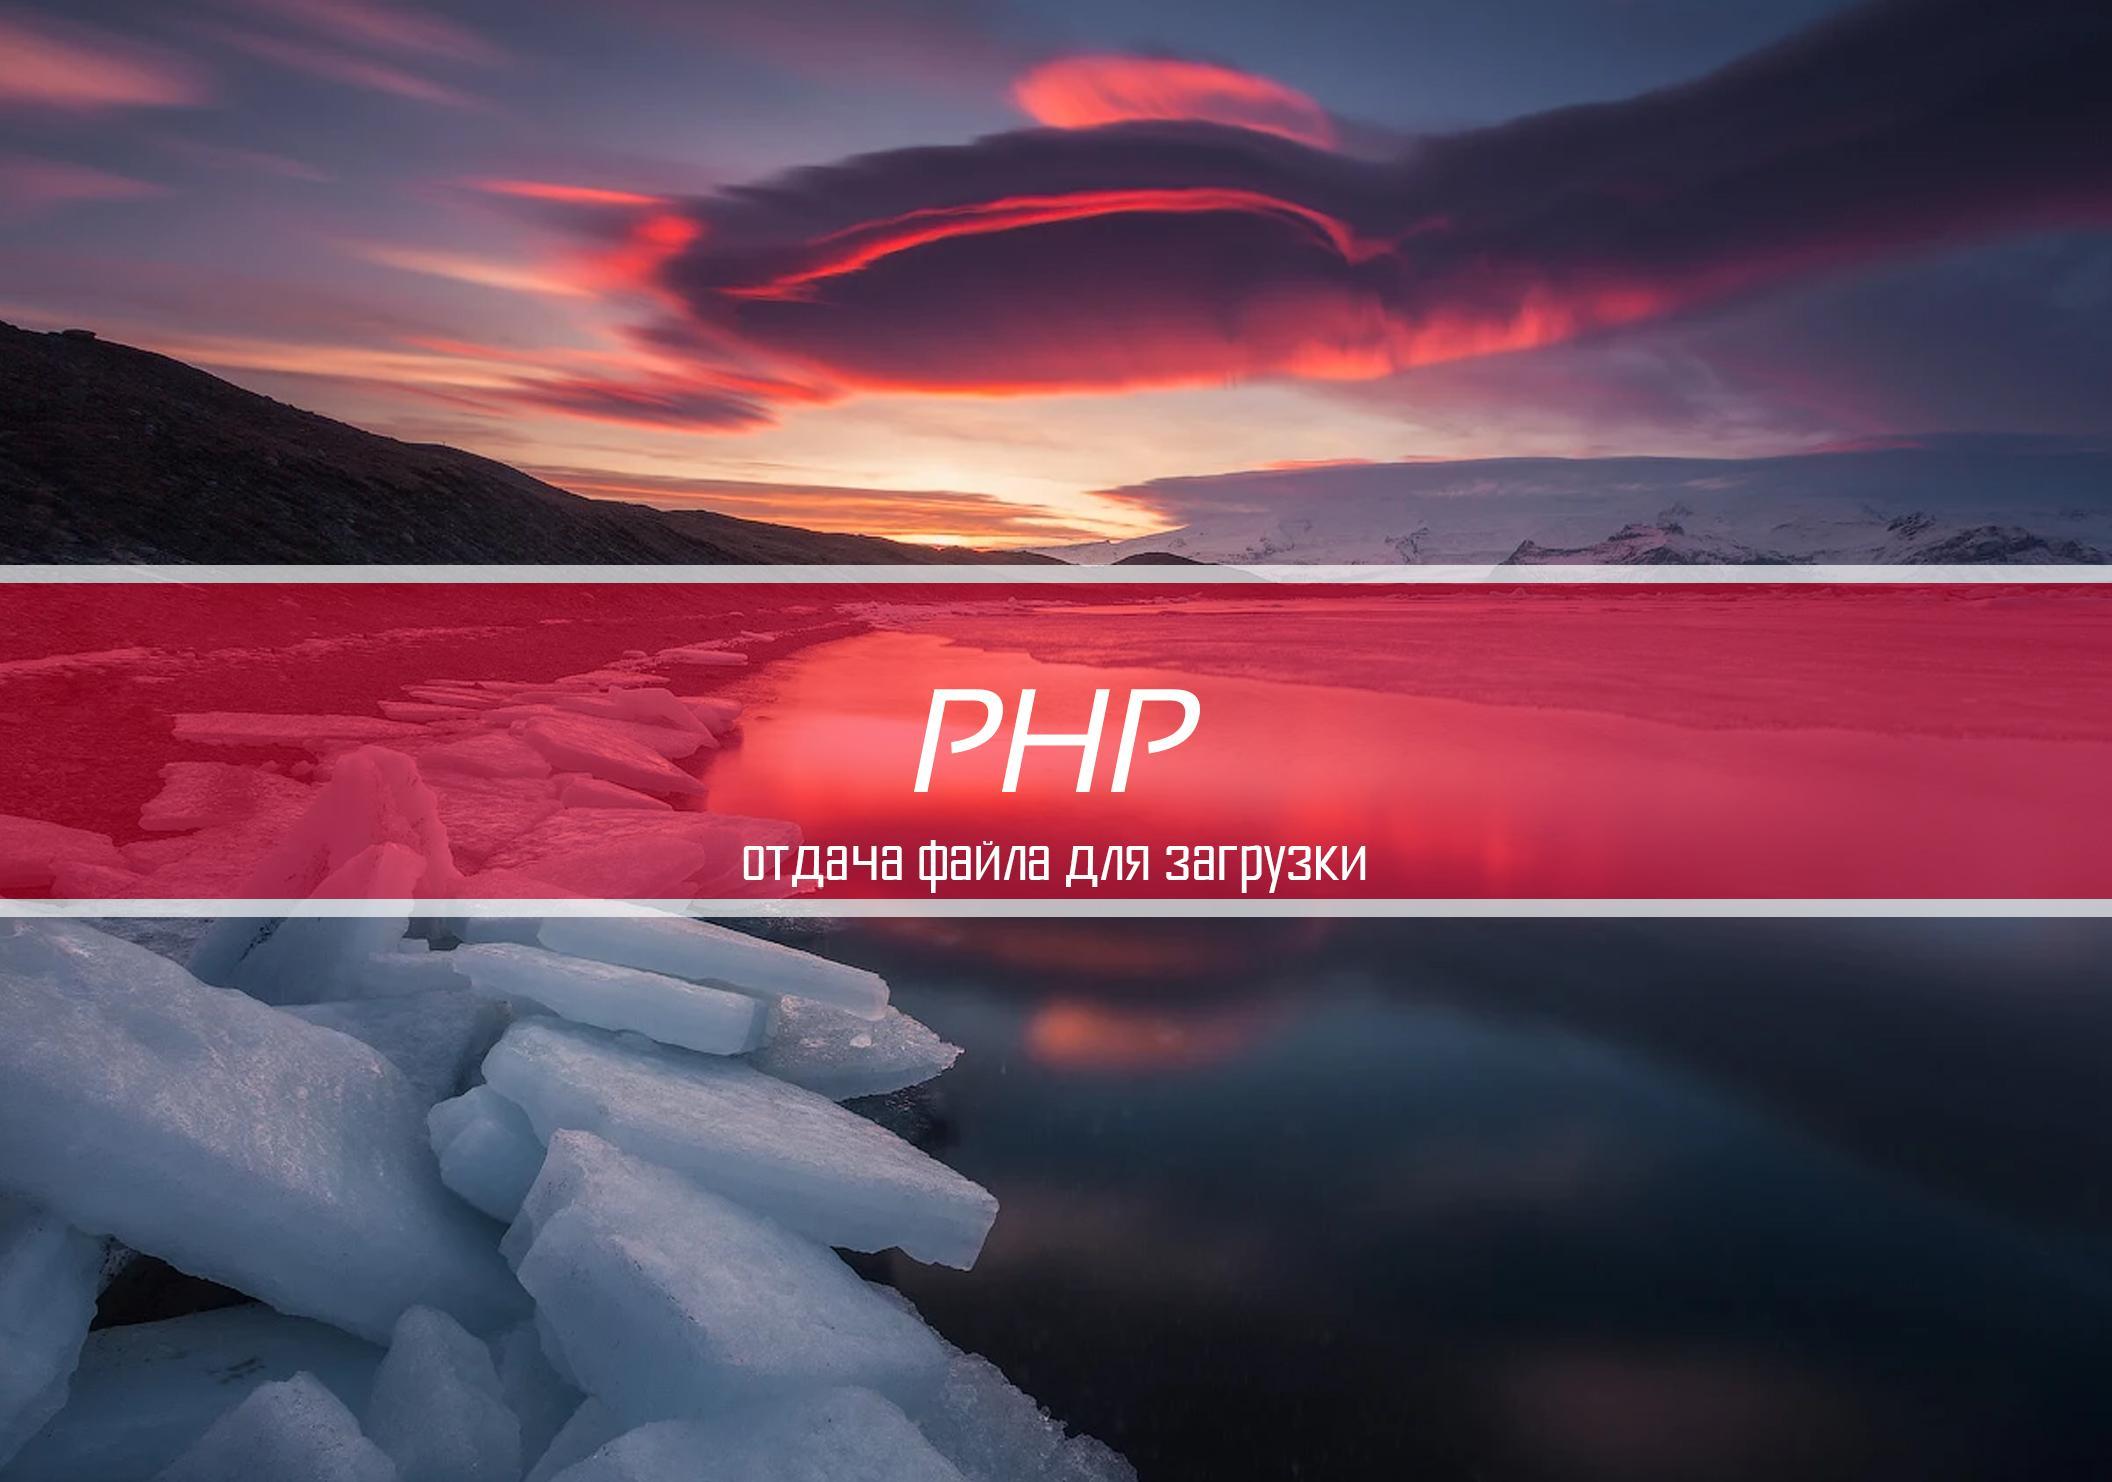 PHP отдача файла для загрузки